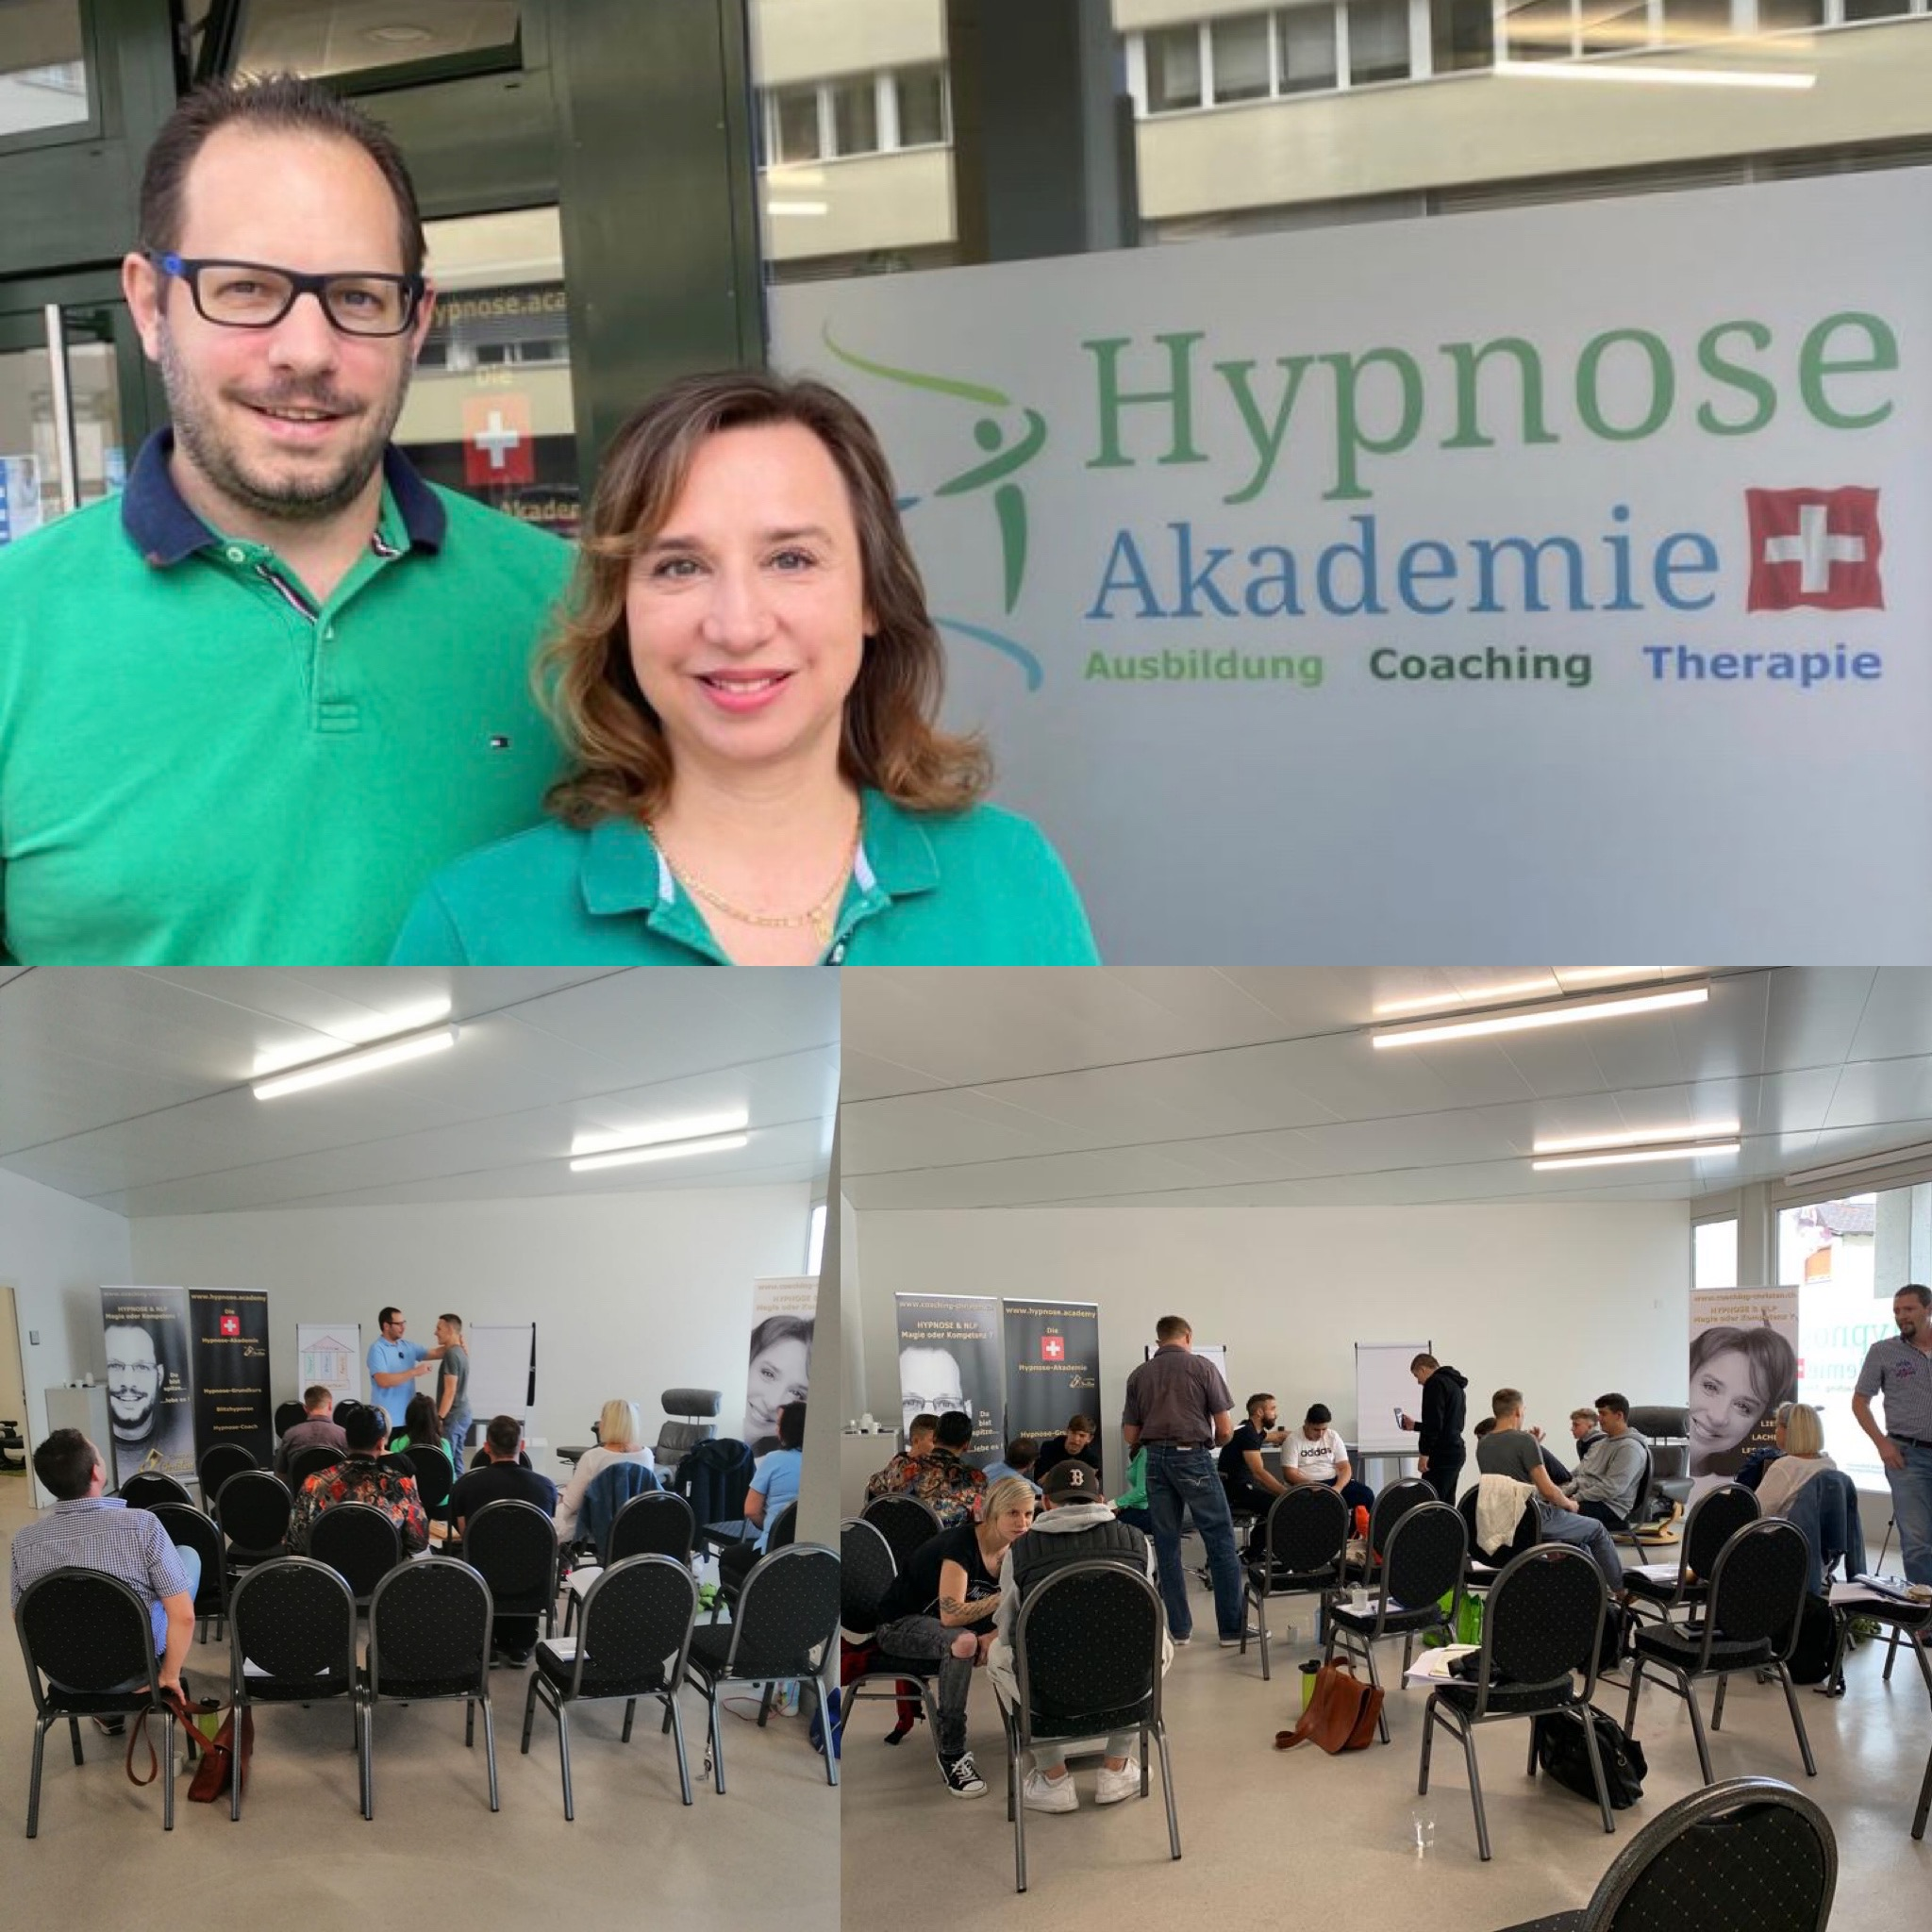 (c) Hypnose.academy